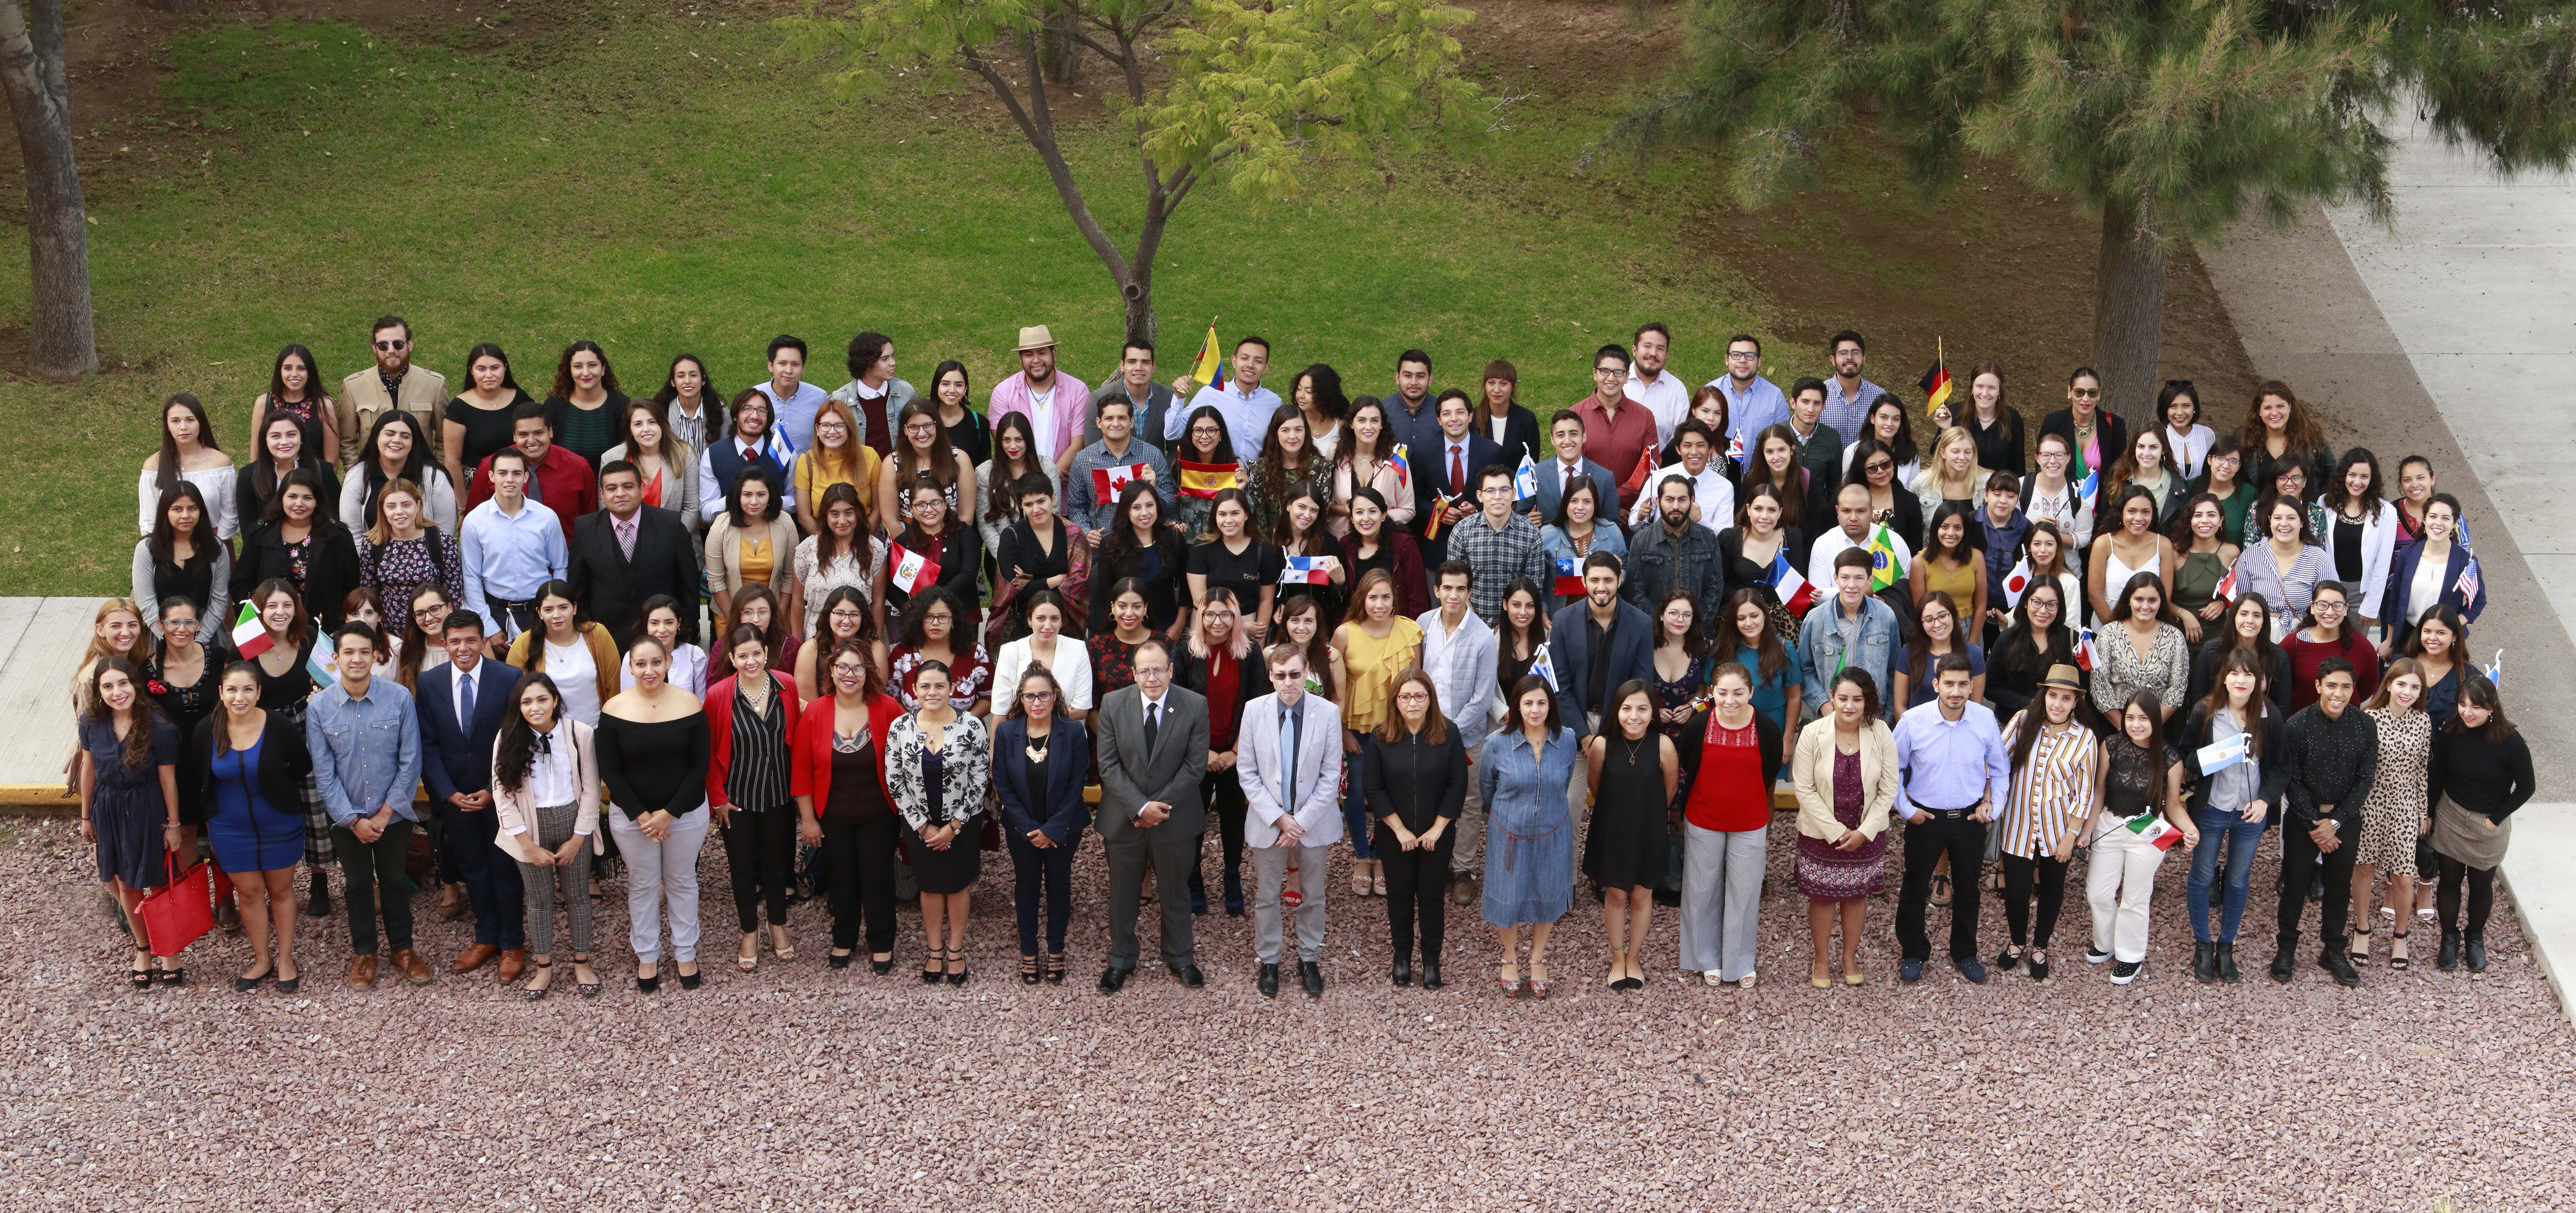 UAA recibe a 267 estudiantes nacionales e internacionales de movilidad académica